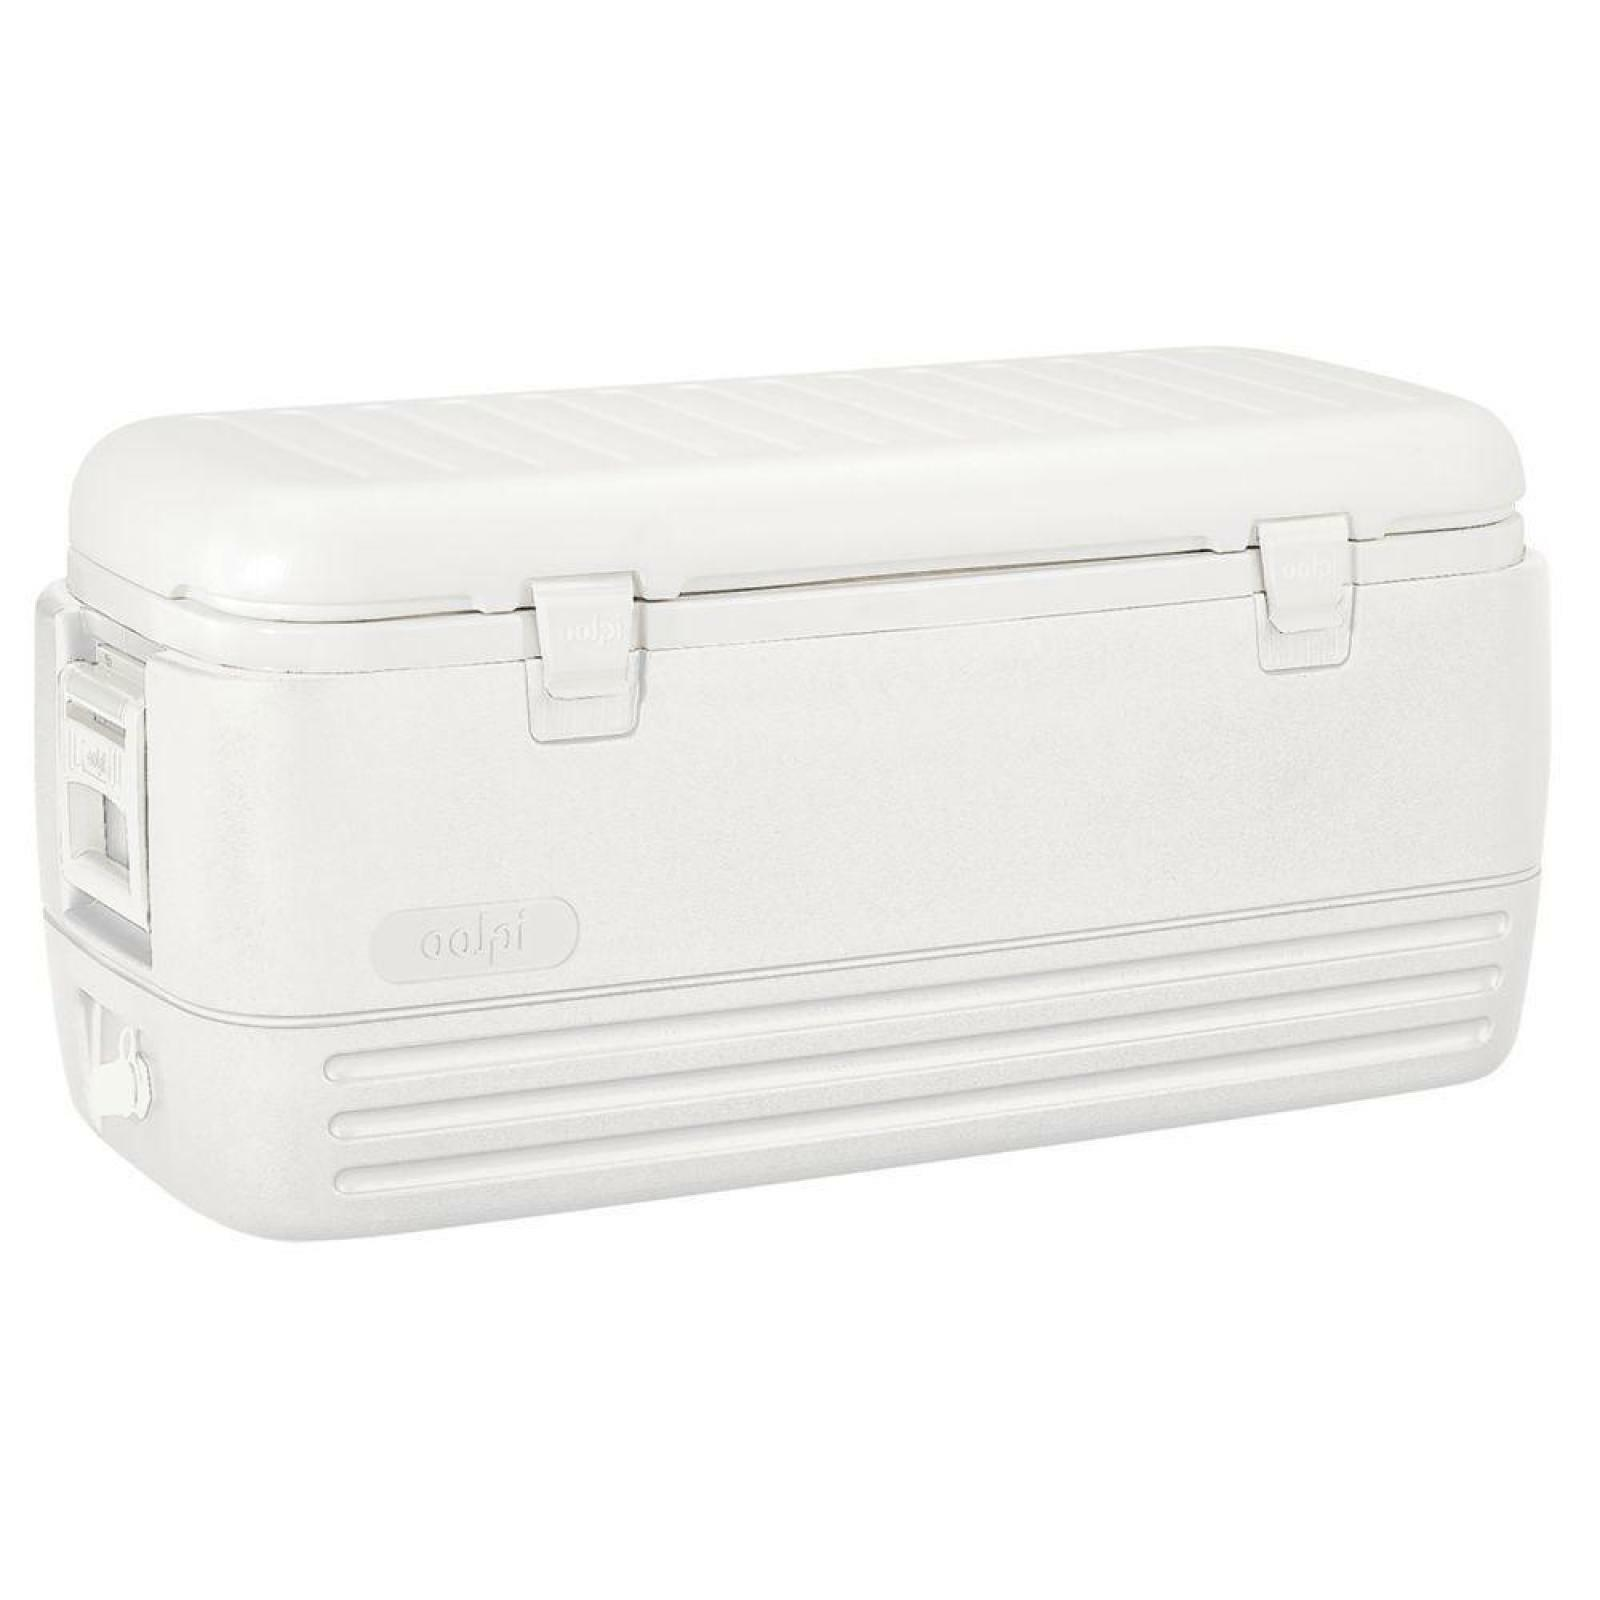 IGLOO 120 Qt Ice Chest Cooler w/ Retractable Handles